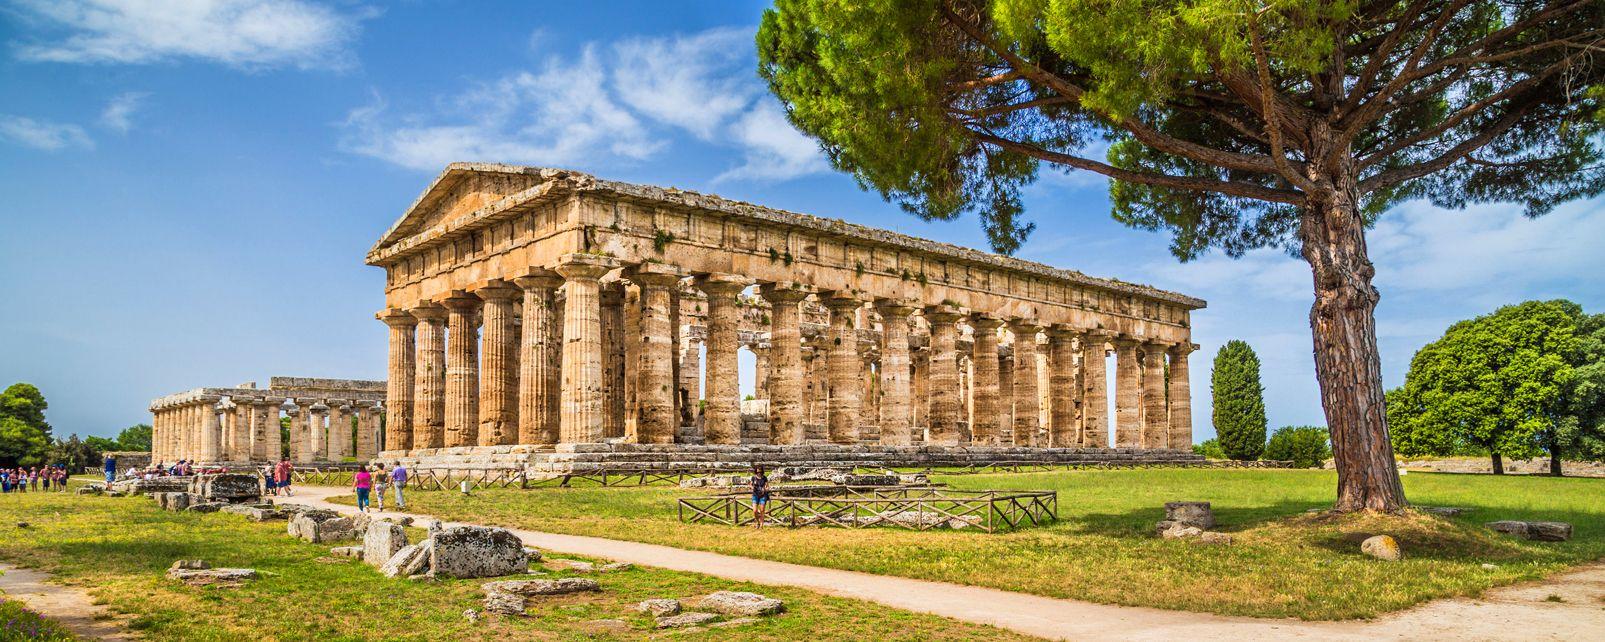 Temples of Paestum , Italy